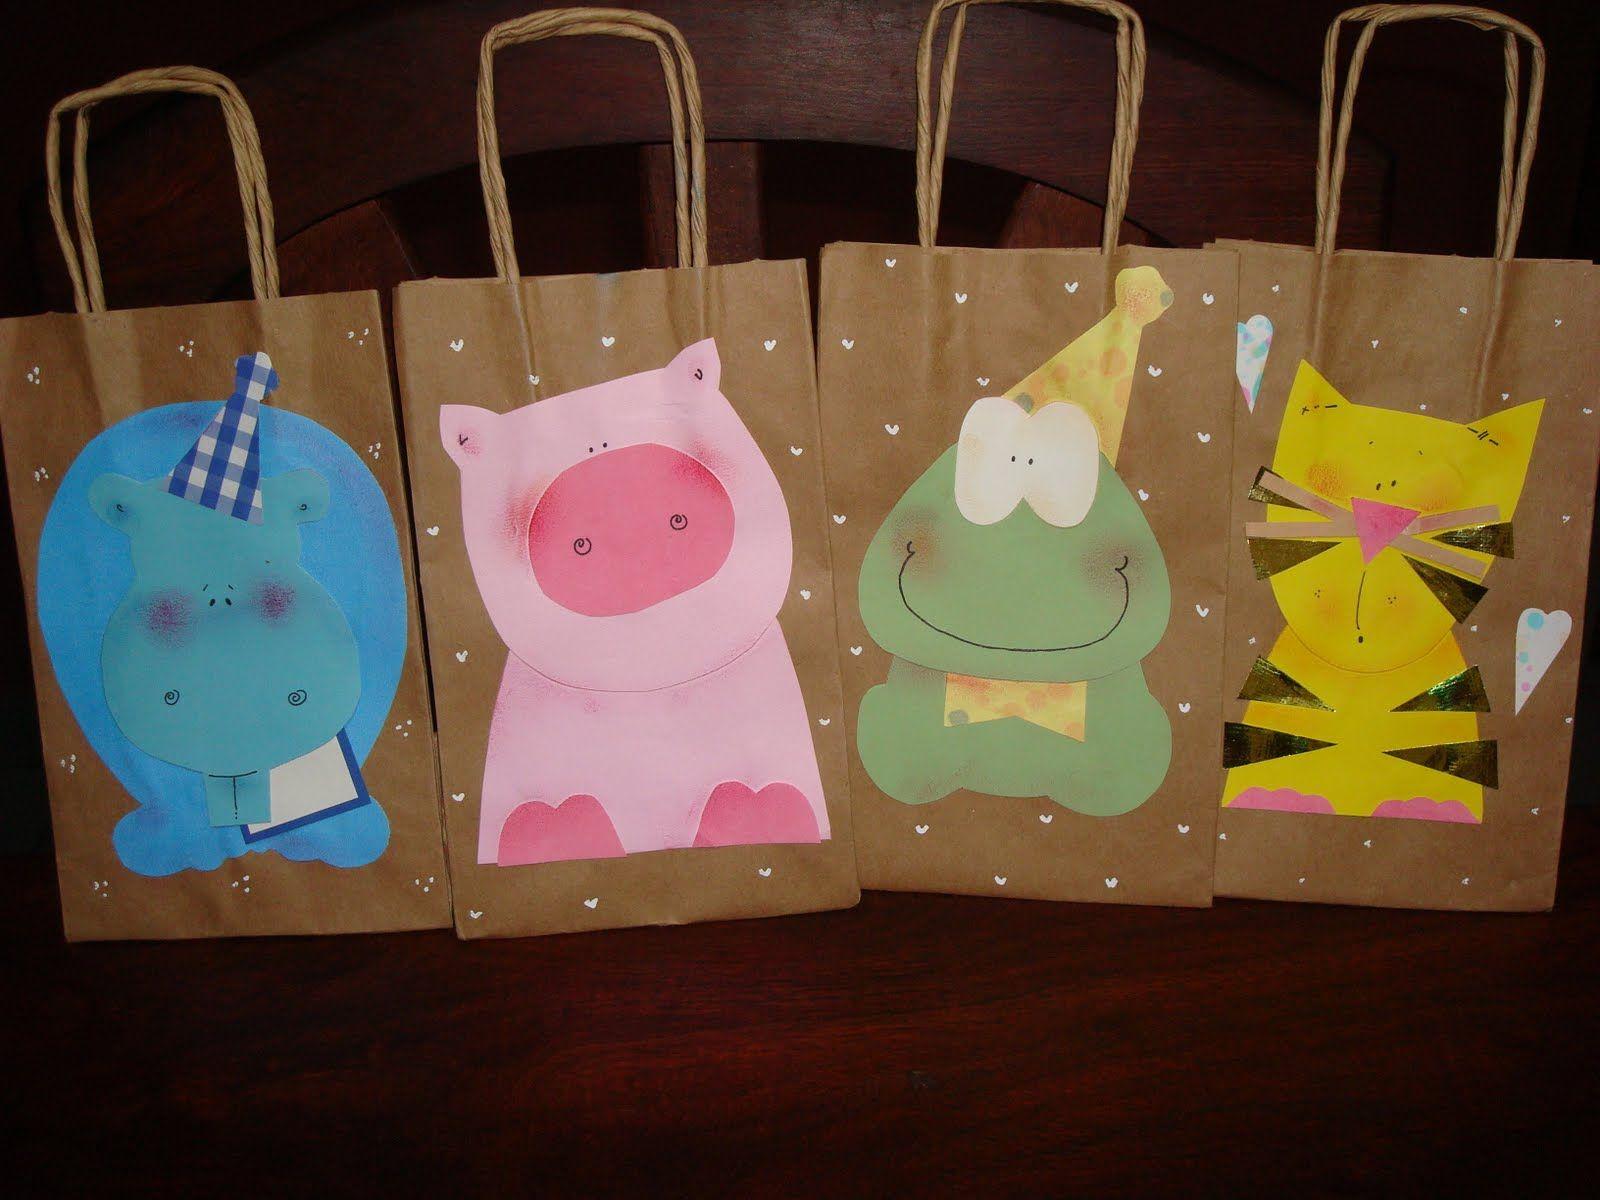 Tela Papel Y Tijera Bolsas Para Cumpleanos Kinder Pinterest - Adornos-de-papel-para-cumpleaos